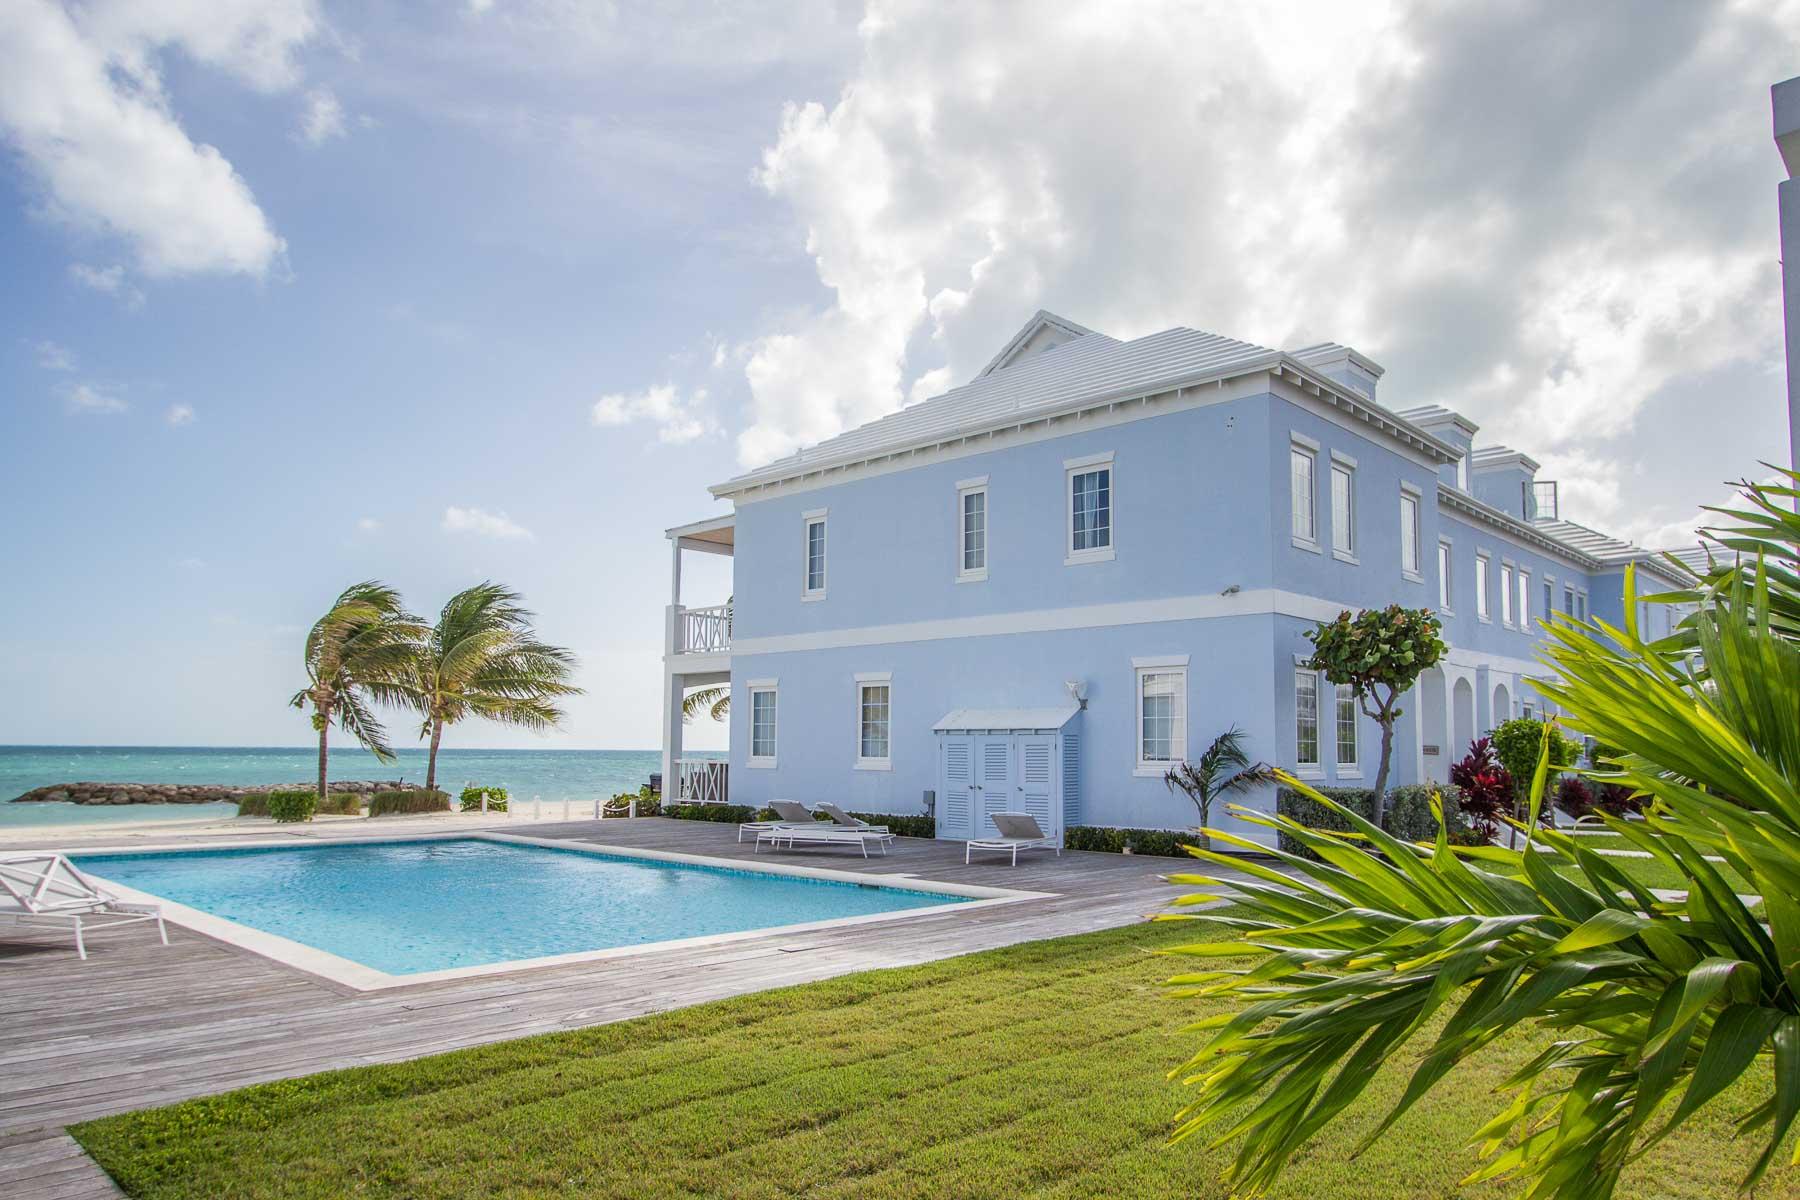 Additional photo for property listing at 1202 Starfish Isle, Palm Cay - MLS 32448 Palm Cay, Yamacraw, Nassau And Paradise Island Bahamas